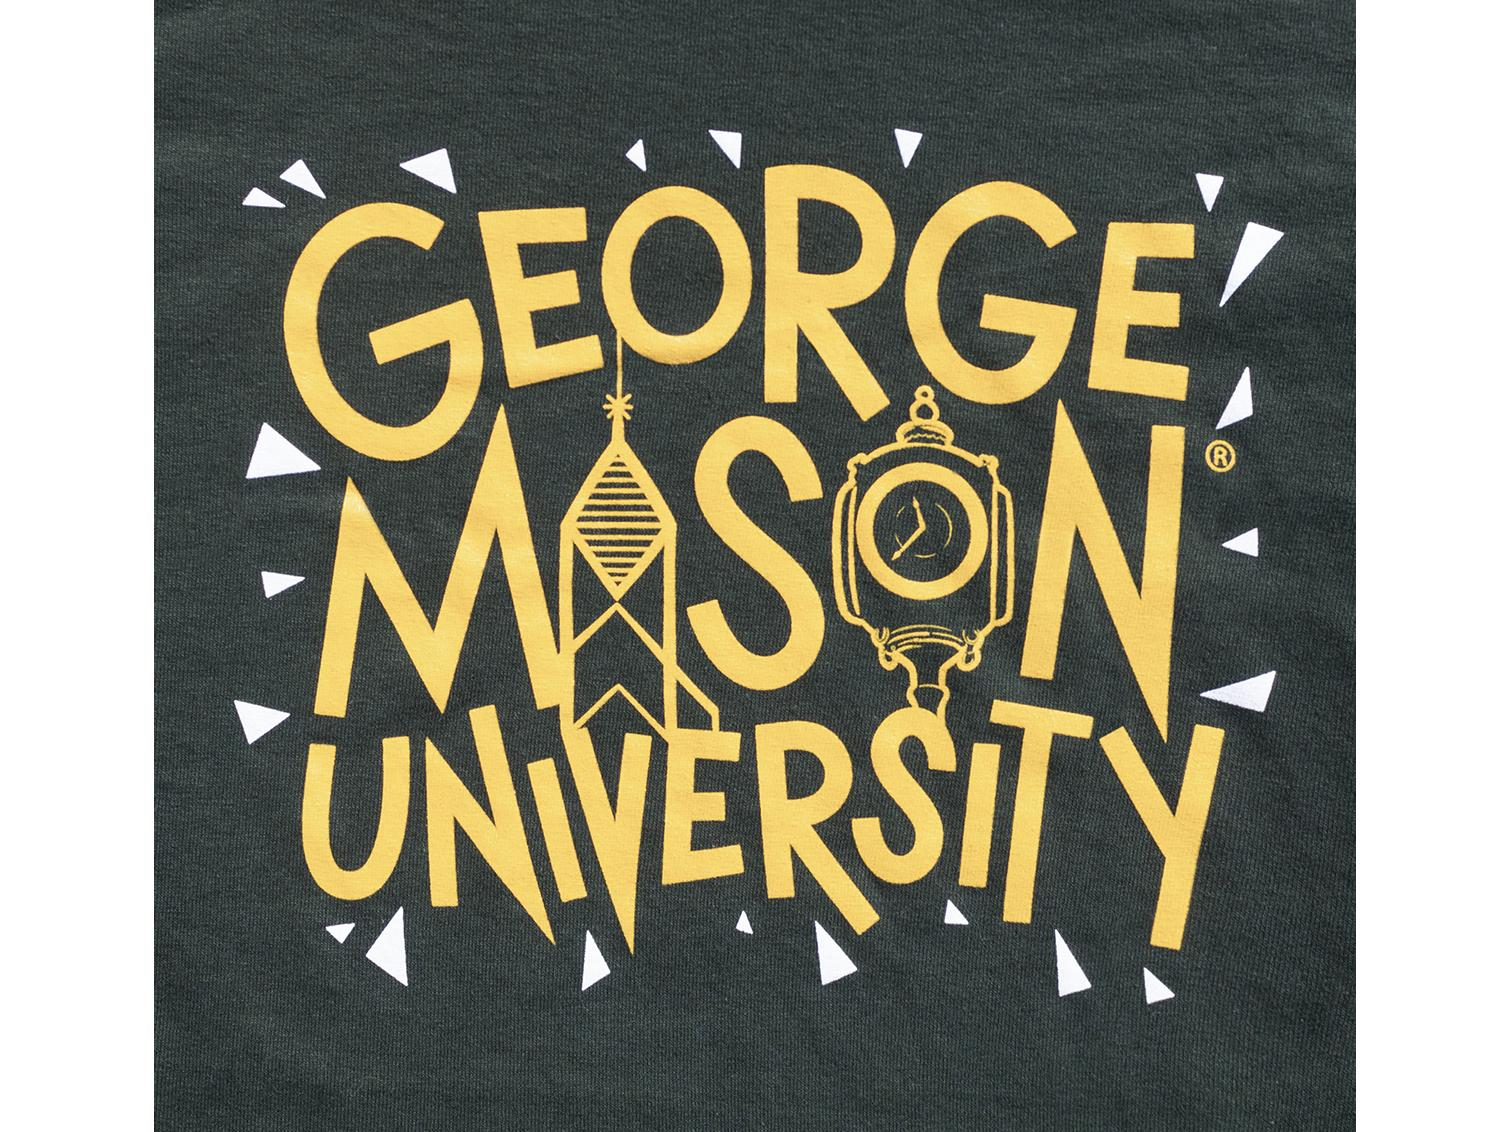 George Mason University Shirt Design typography tshirt tshirt design design gmu george mason university